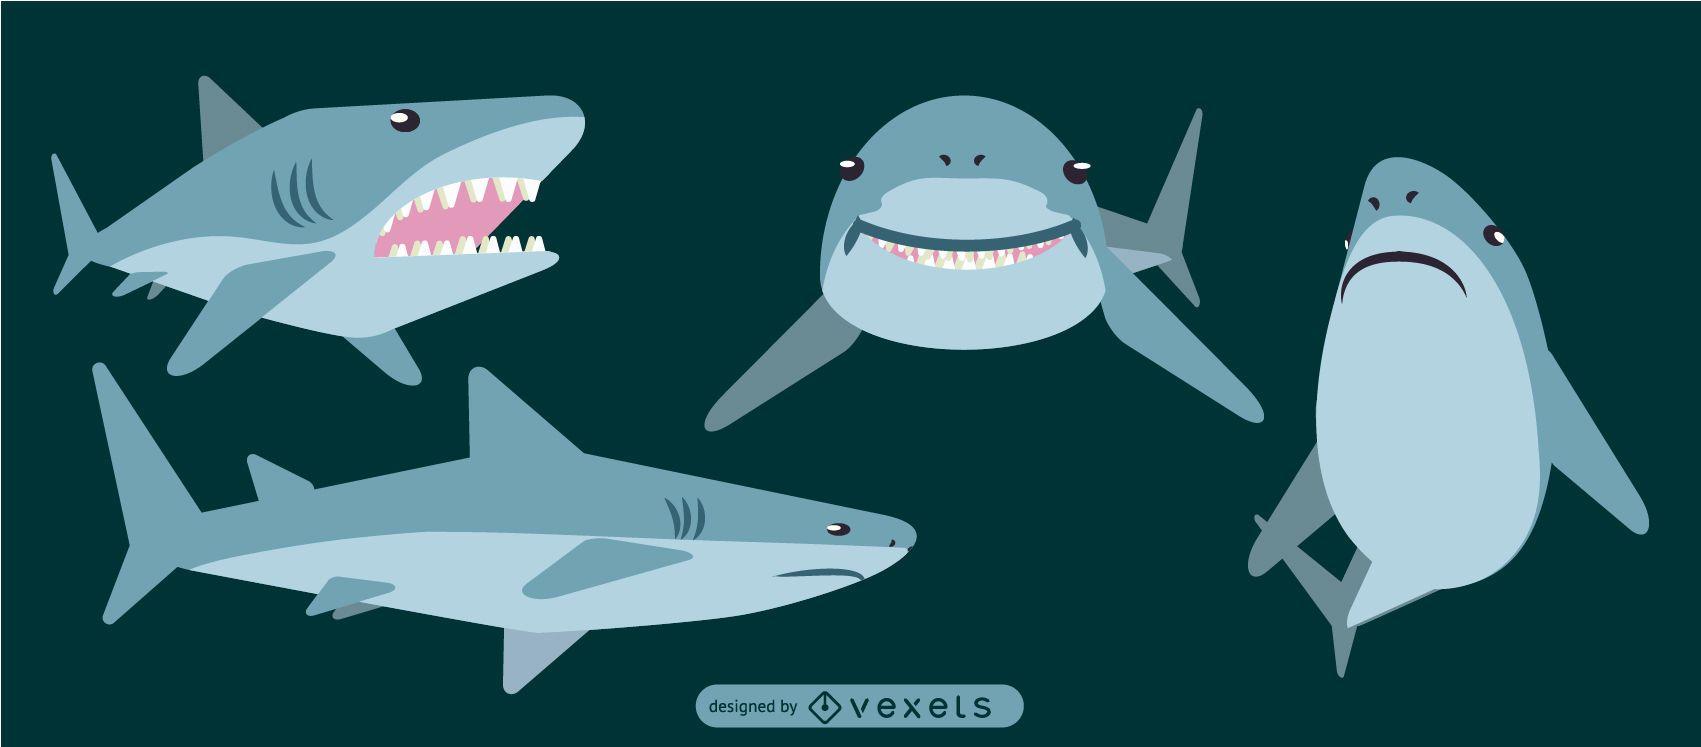 Shark Rounded Flat Geometric Design